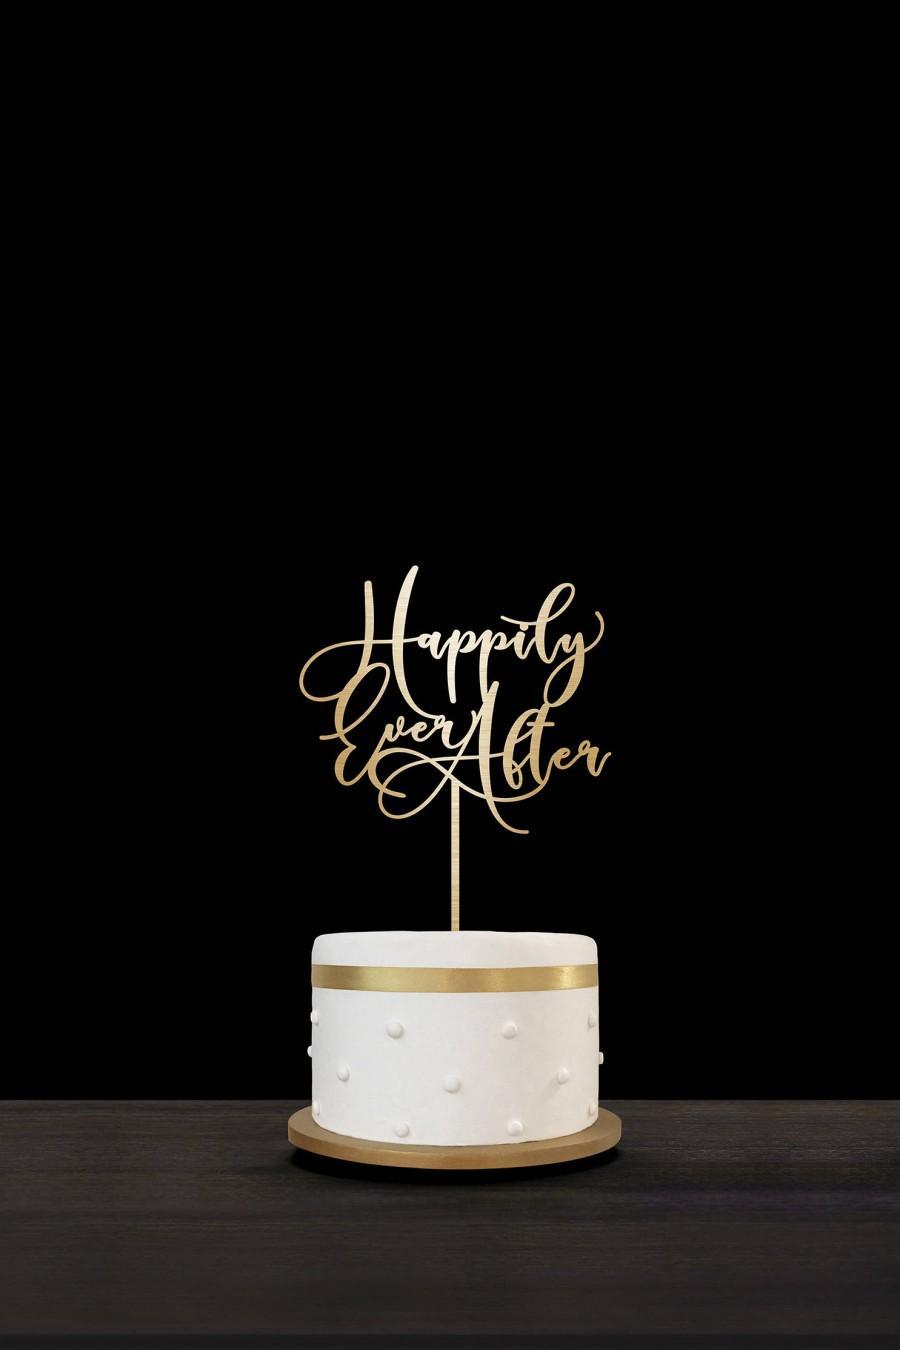 Свадьба - Customized Wedding Cake Topper,Personalized Cake Topper for Wedding,Custom Personalized Wedding Cake Topper Happily Ever After Cake Topper 5